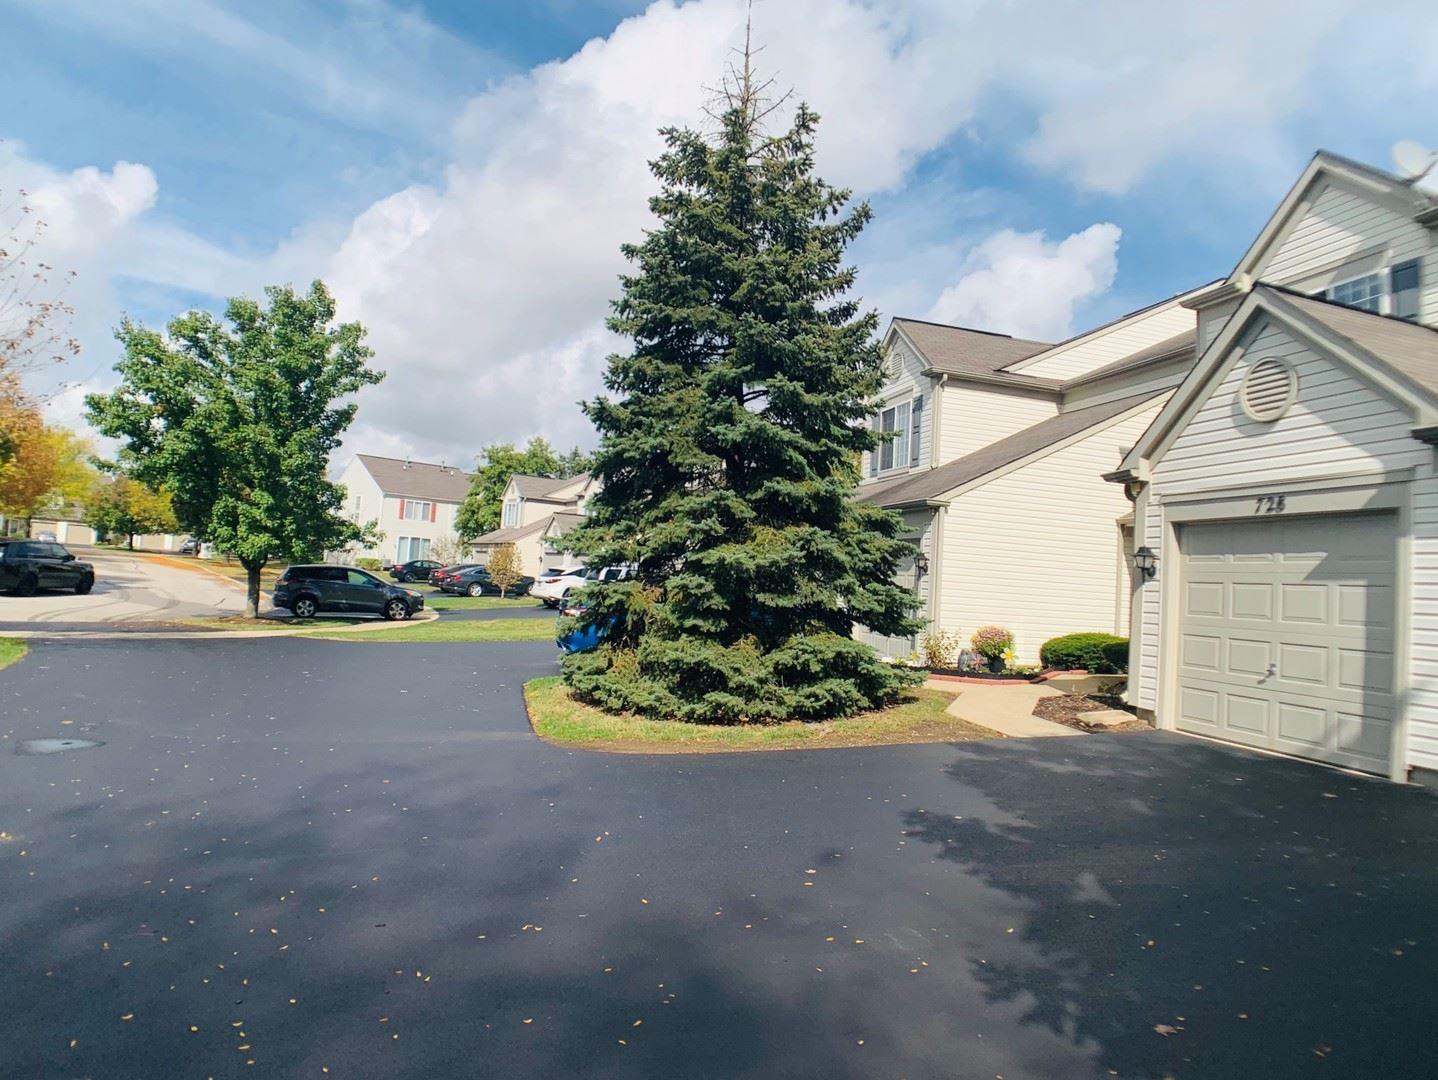 Photo of 728 Blossom Court, Naperville, IL 60540 (MLS # 11254075)